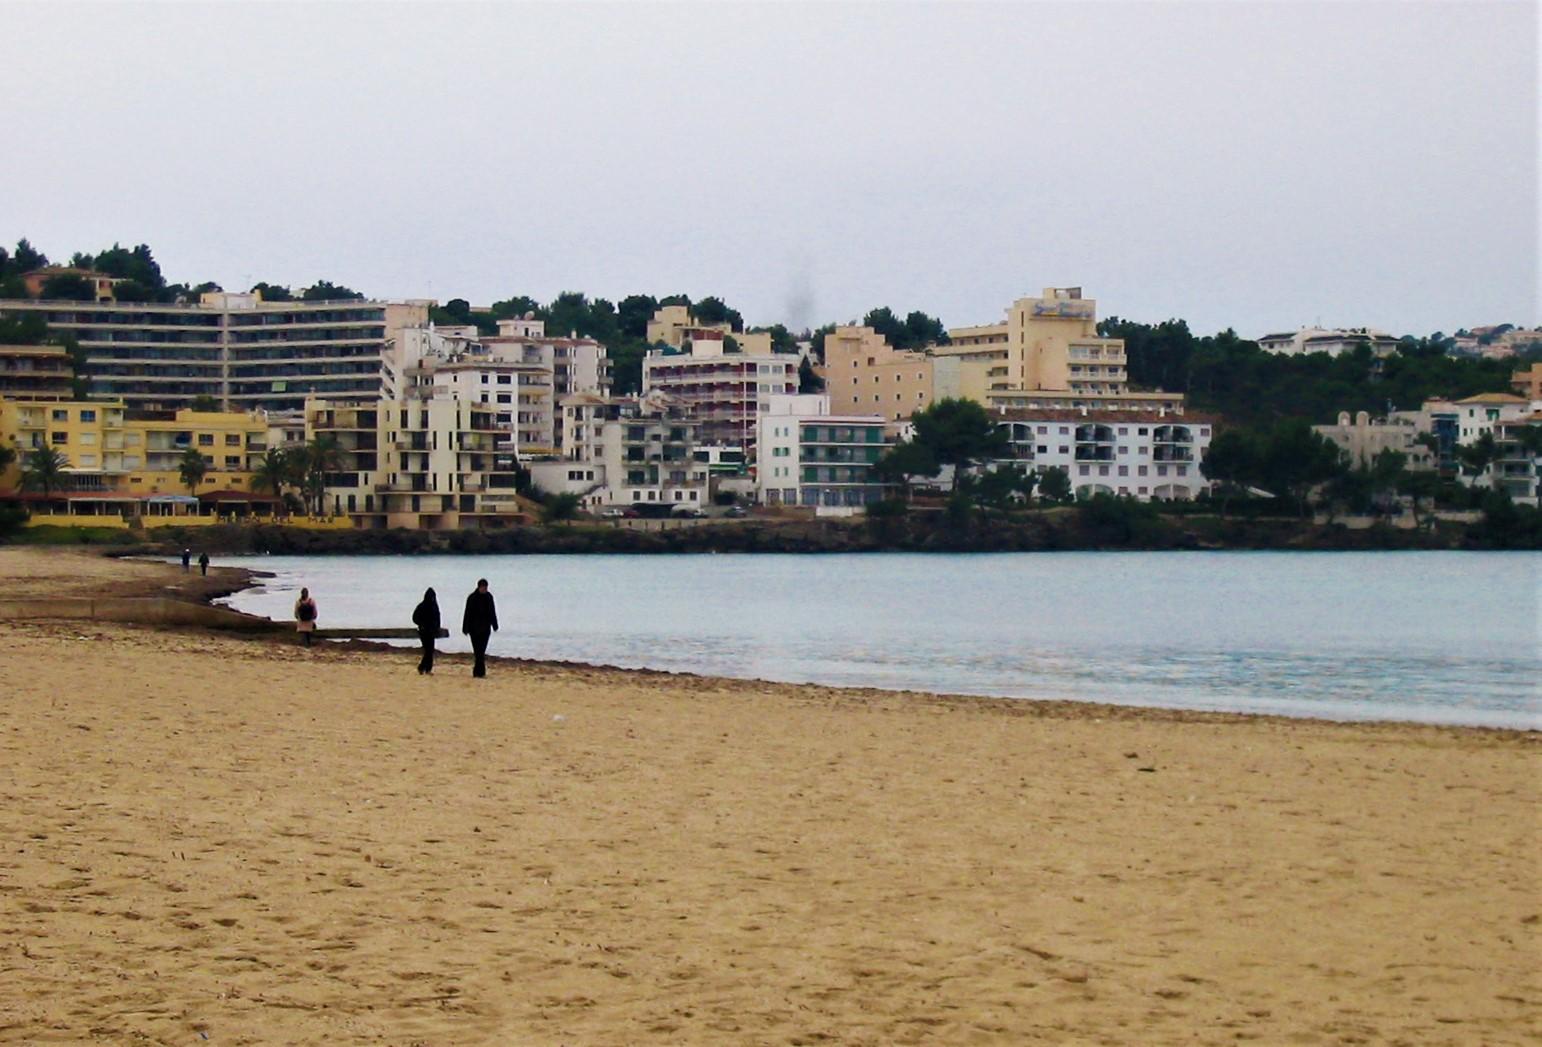 Santa Ponsa Beach, Mallorca